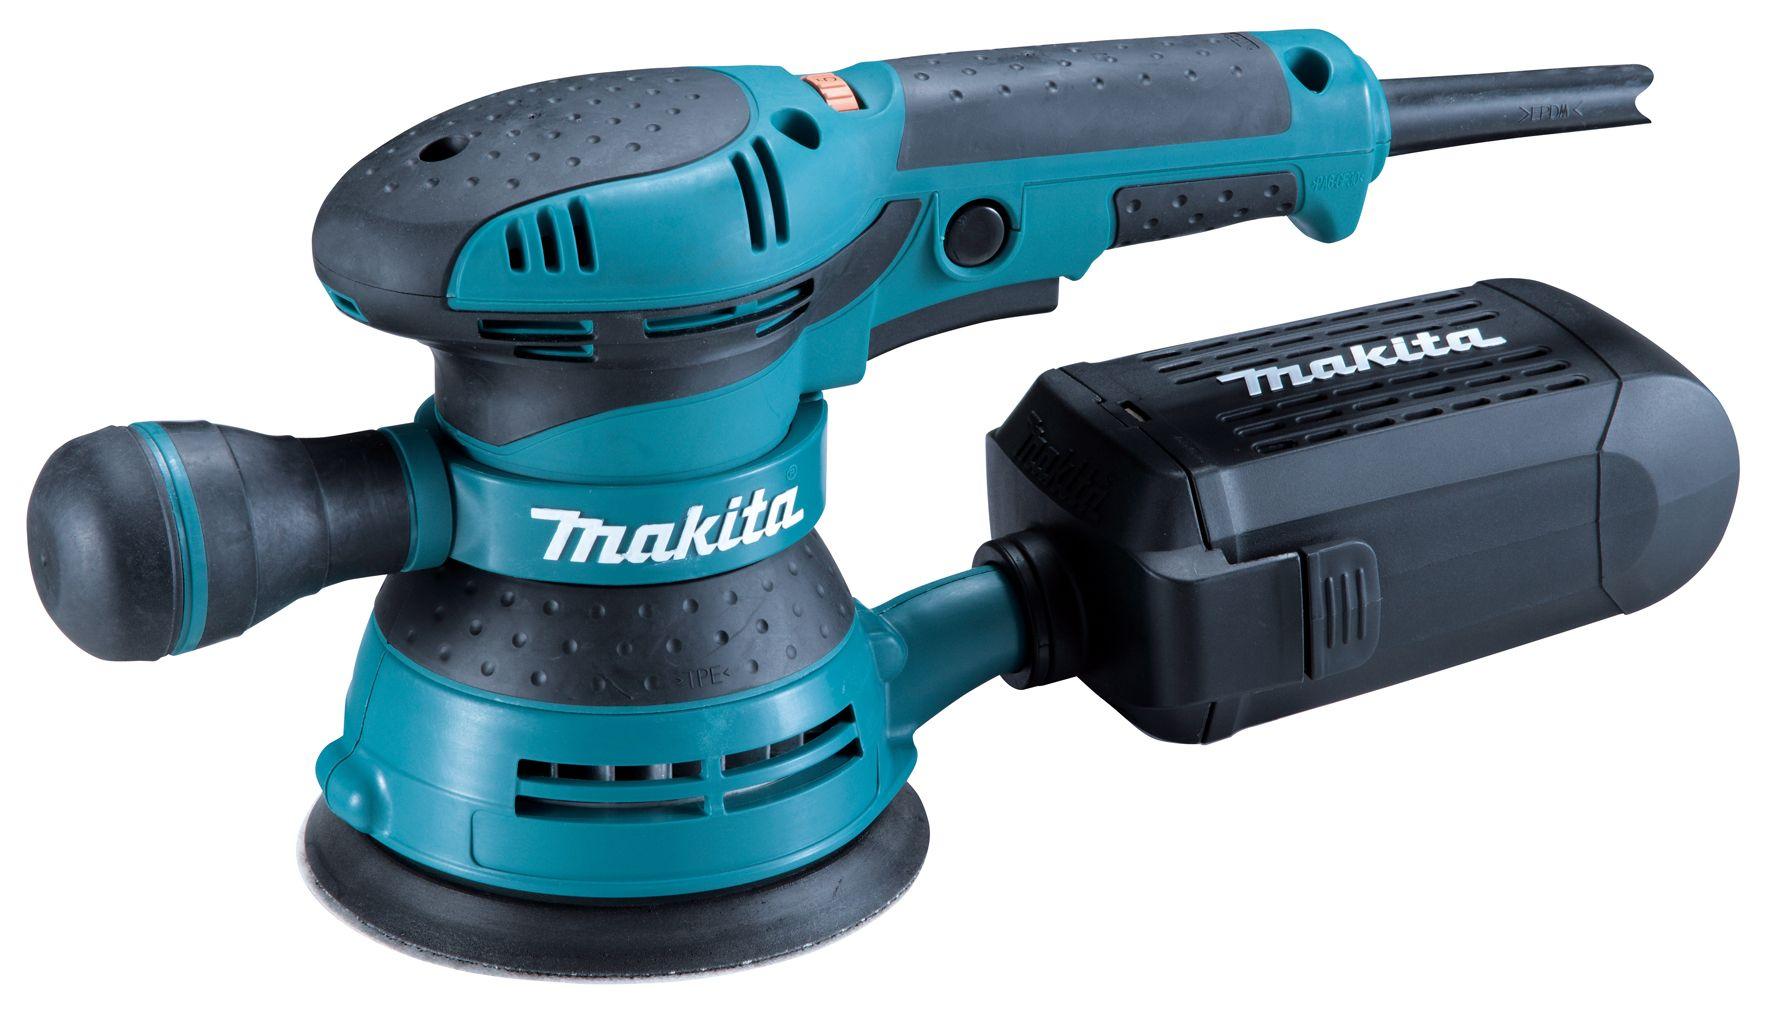 Vaak Makita BO5041 kopen? | Snelle levering - Gereedschapcentrum.nl RM75